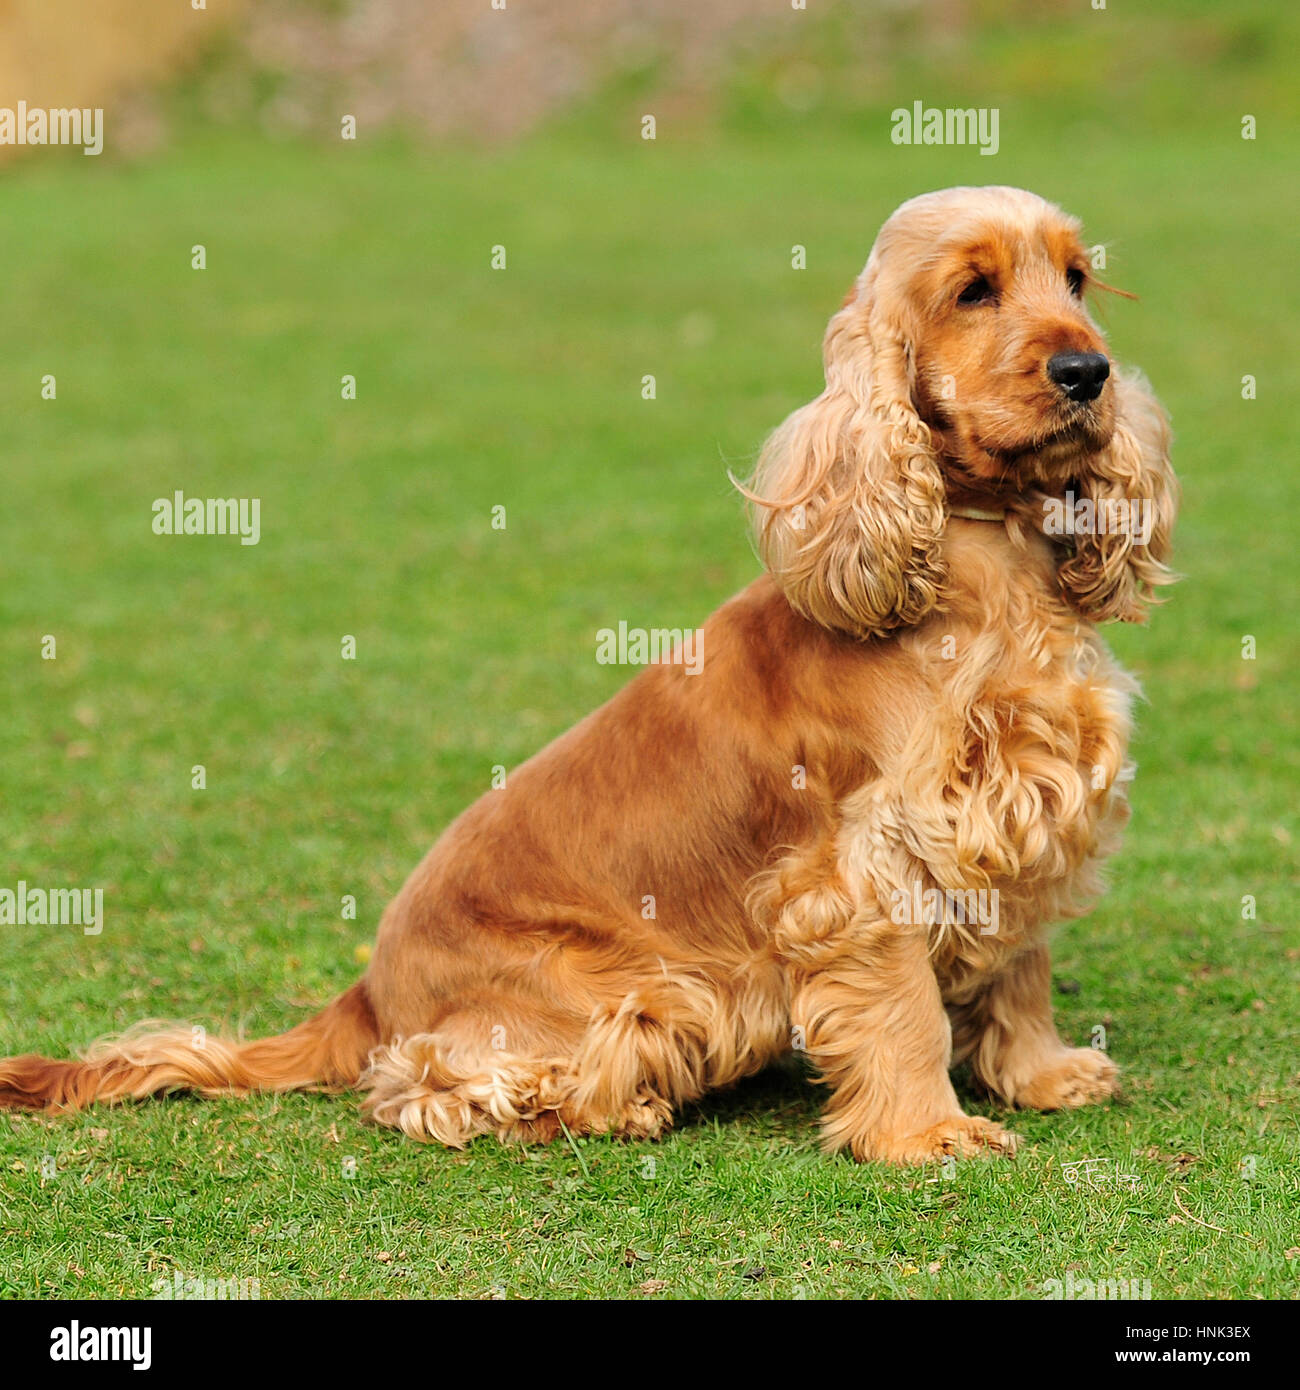 golden english cocker spaniel - Stock Image